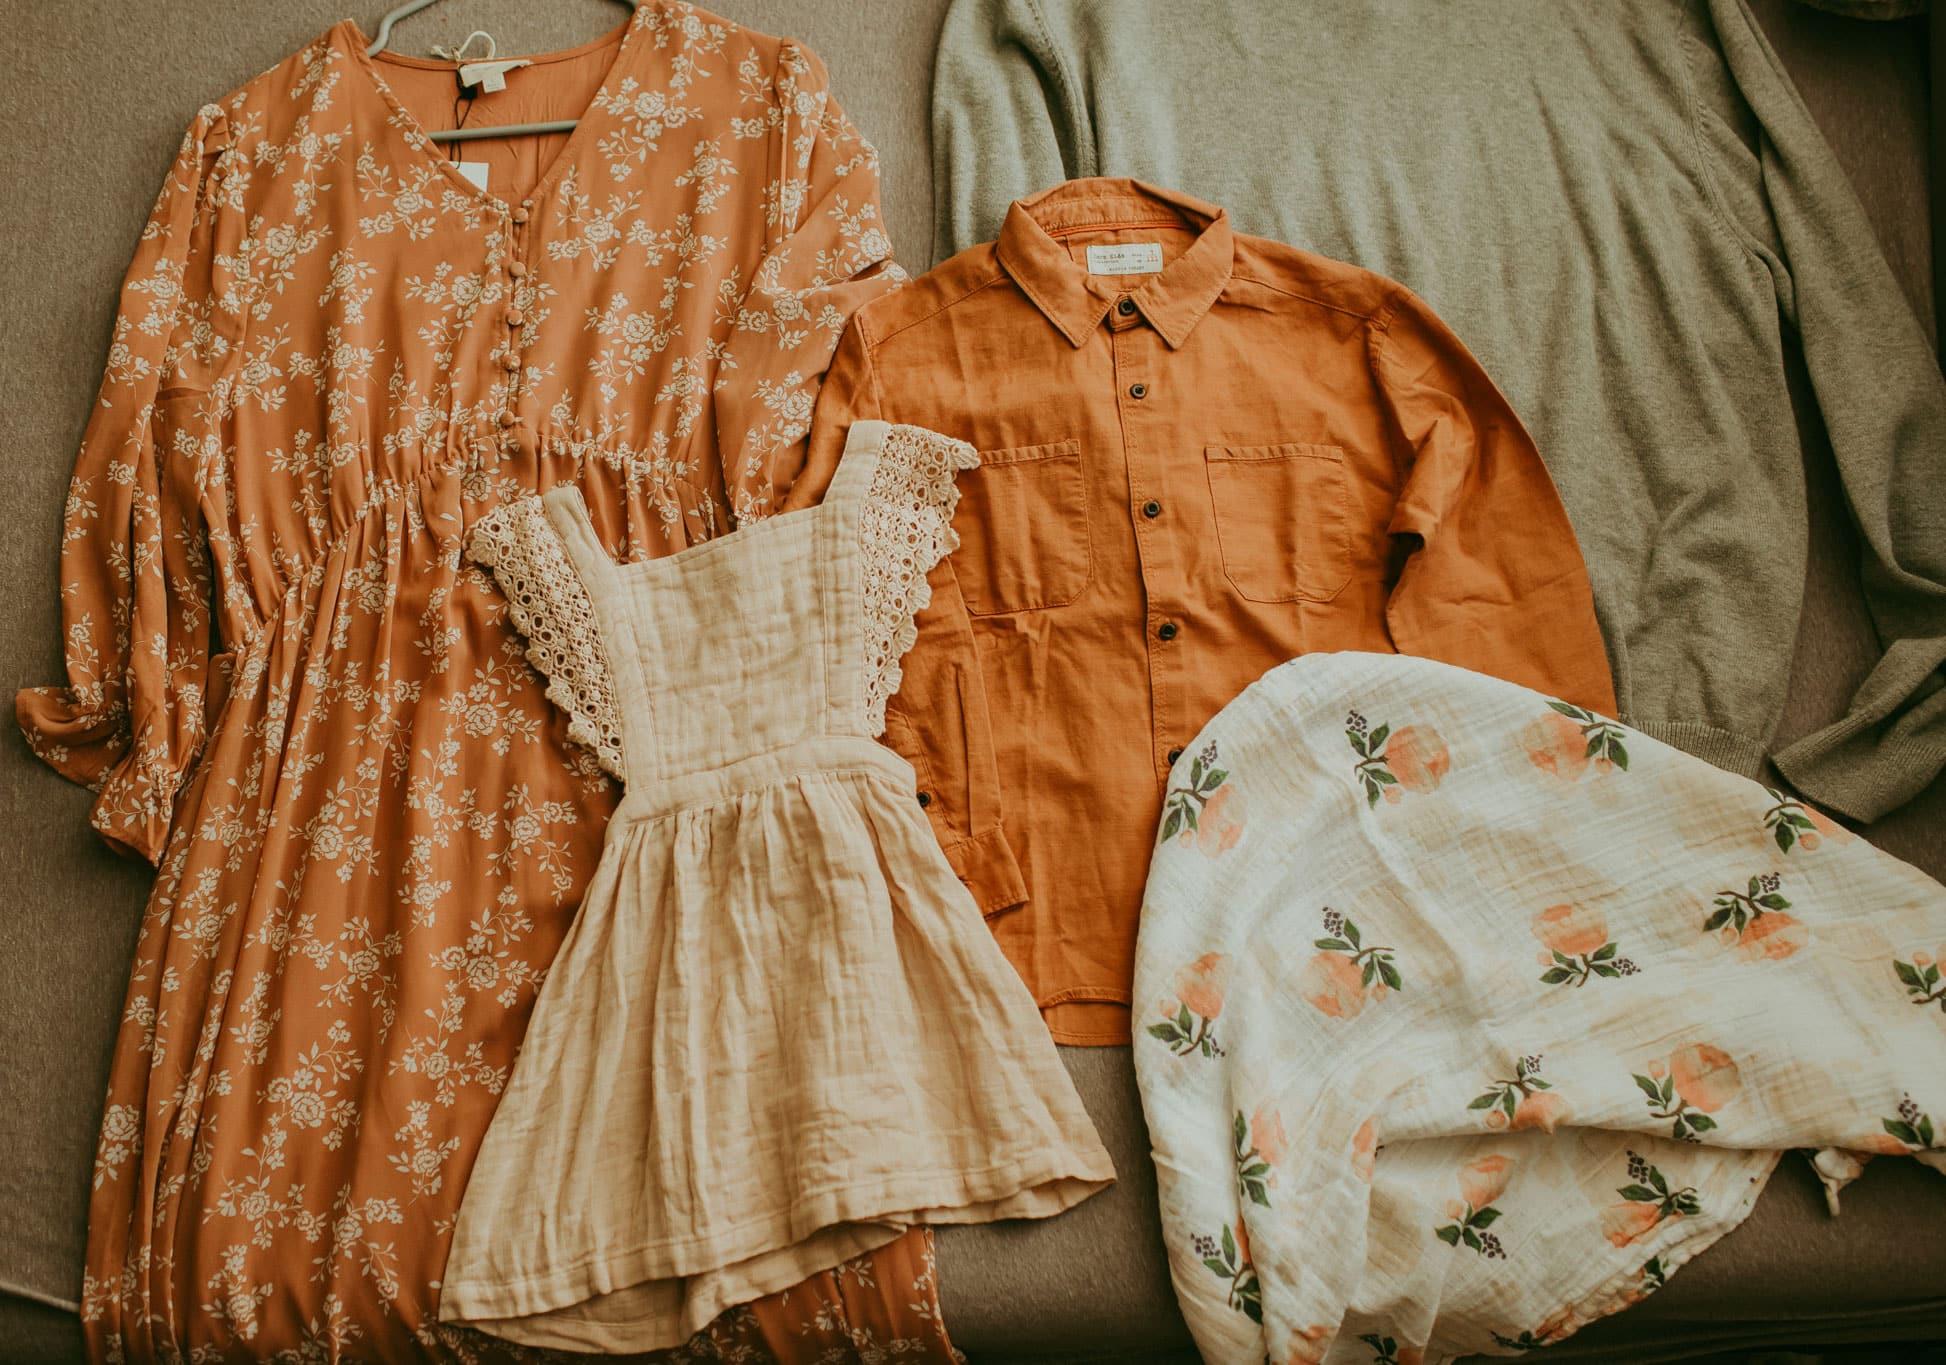 clothing laid on a bed   Jamie Kay dress,  zara shirt, Roolee dress